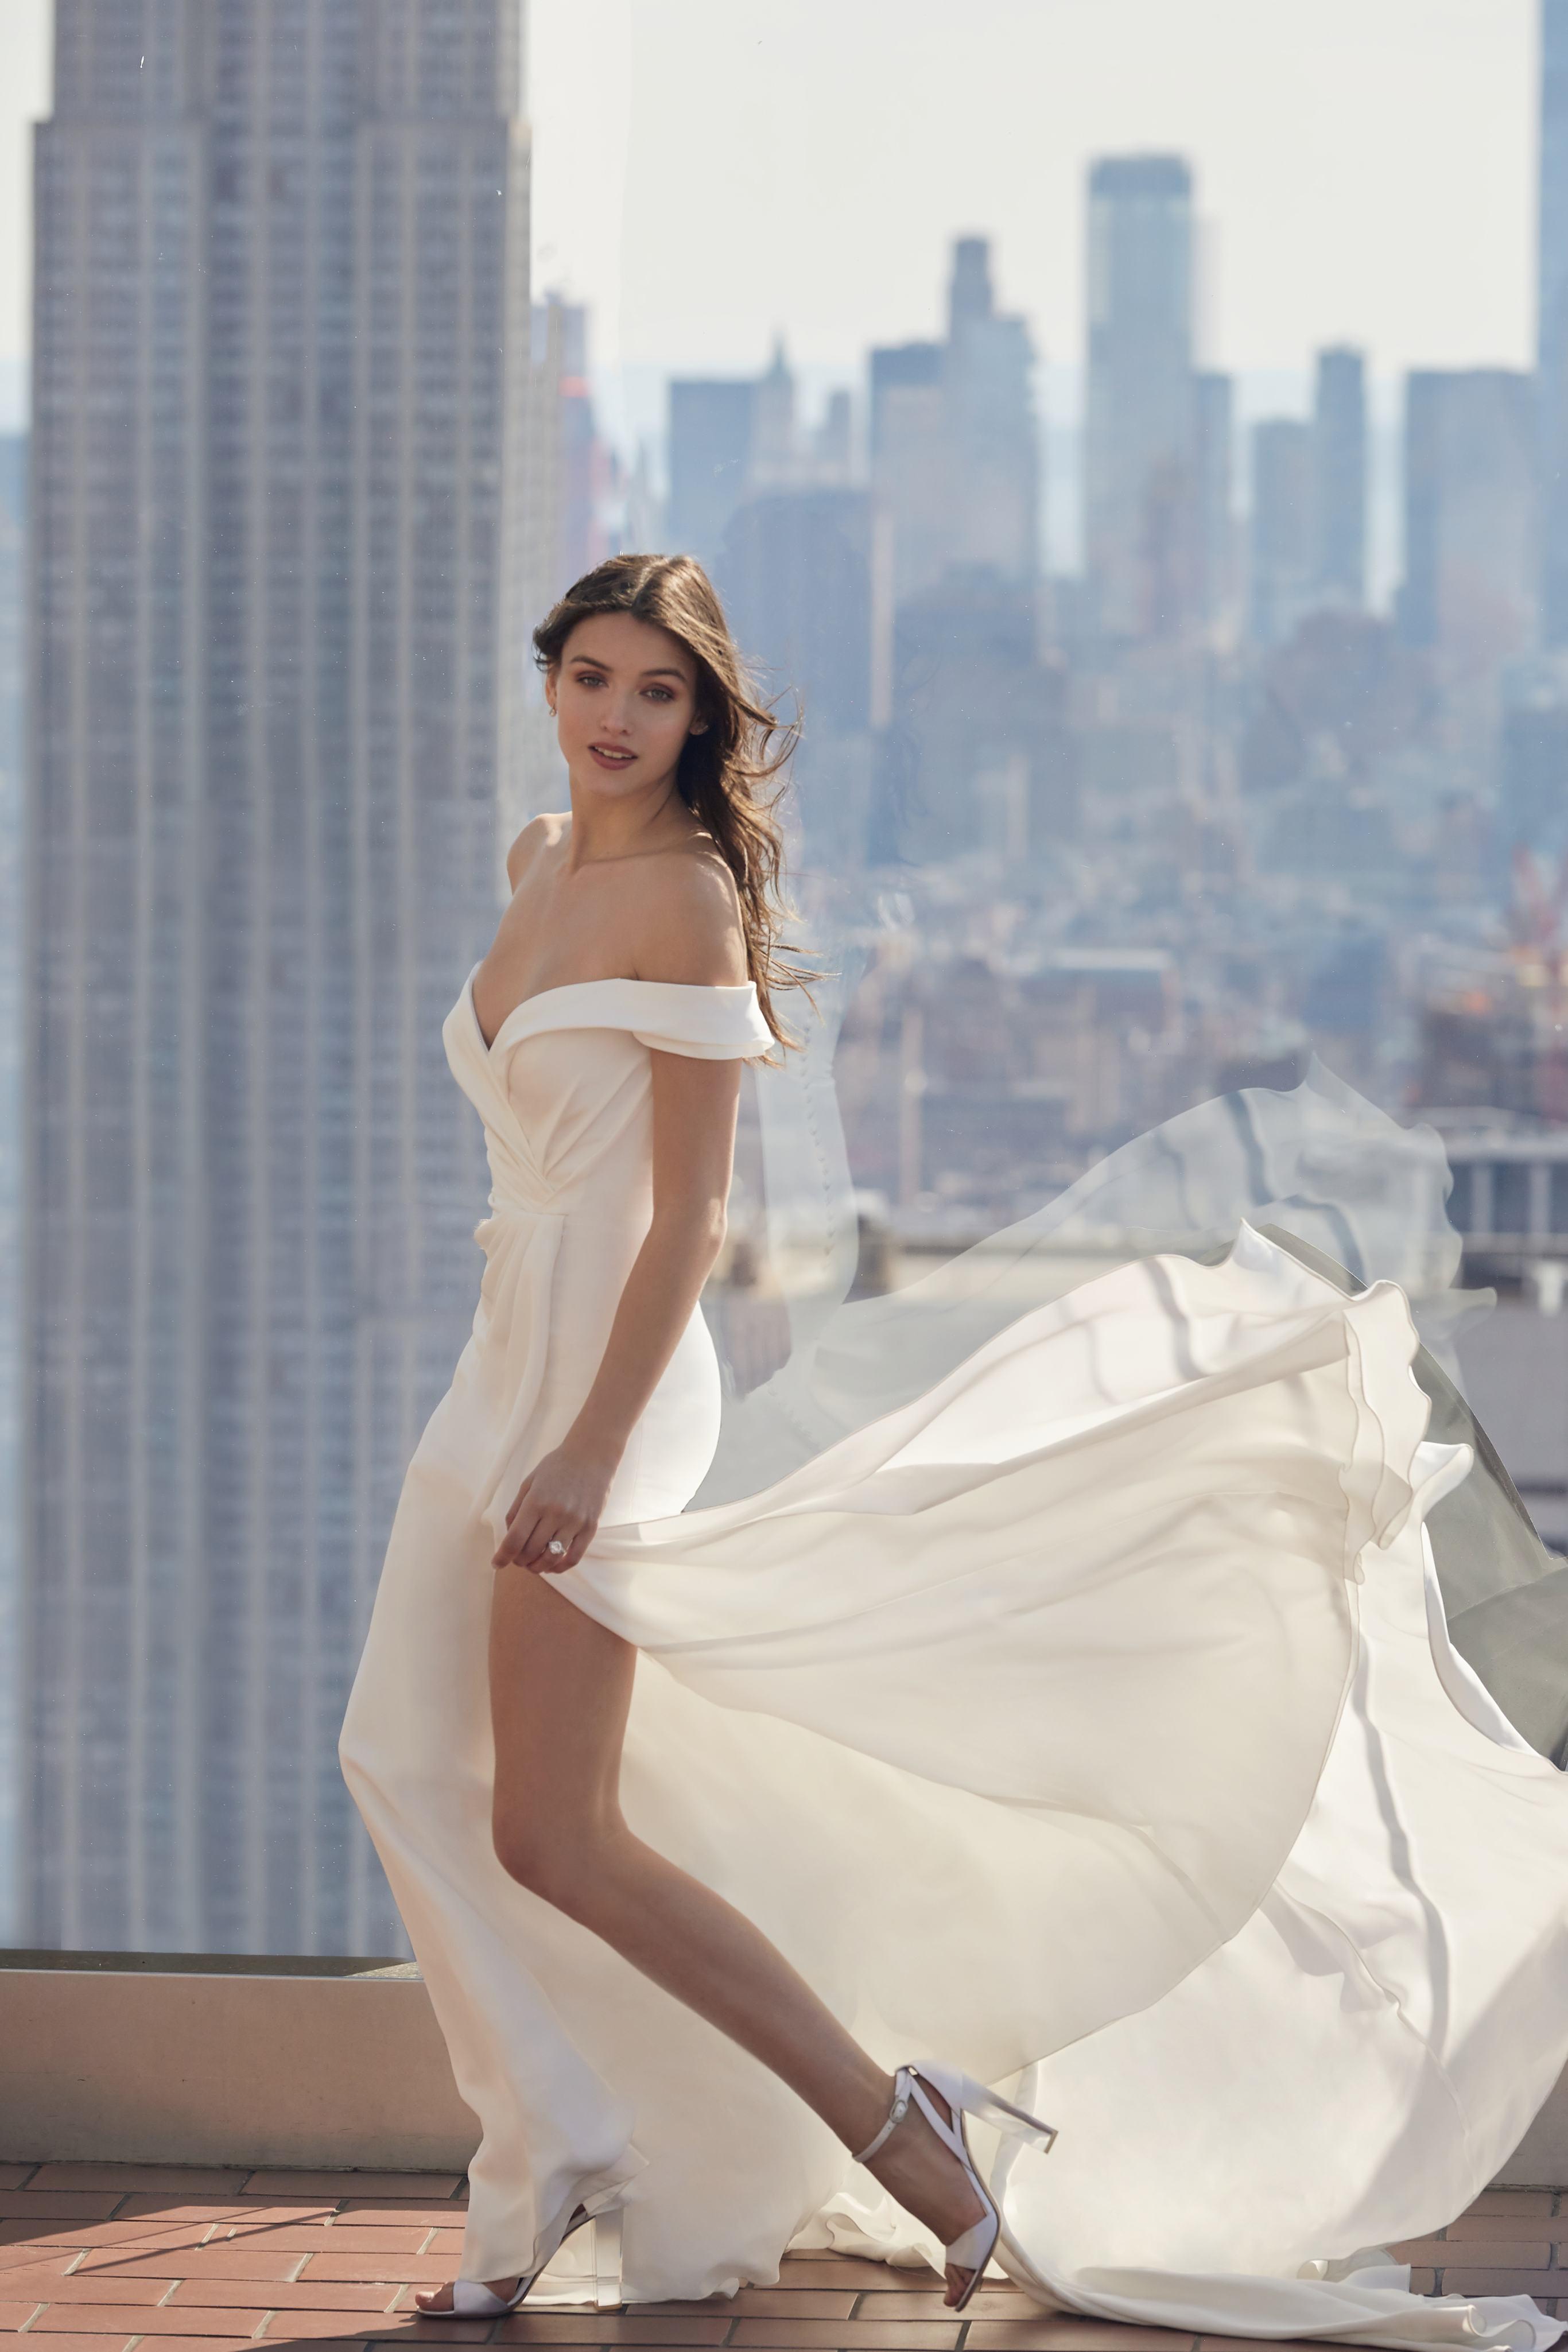 monique lhuillier bliss off the shoulder high slit wedding dress spring 2020